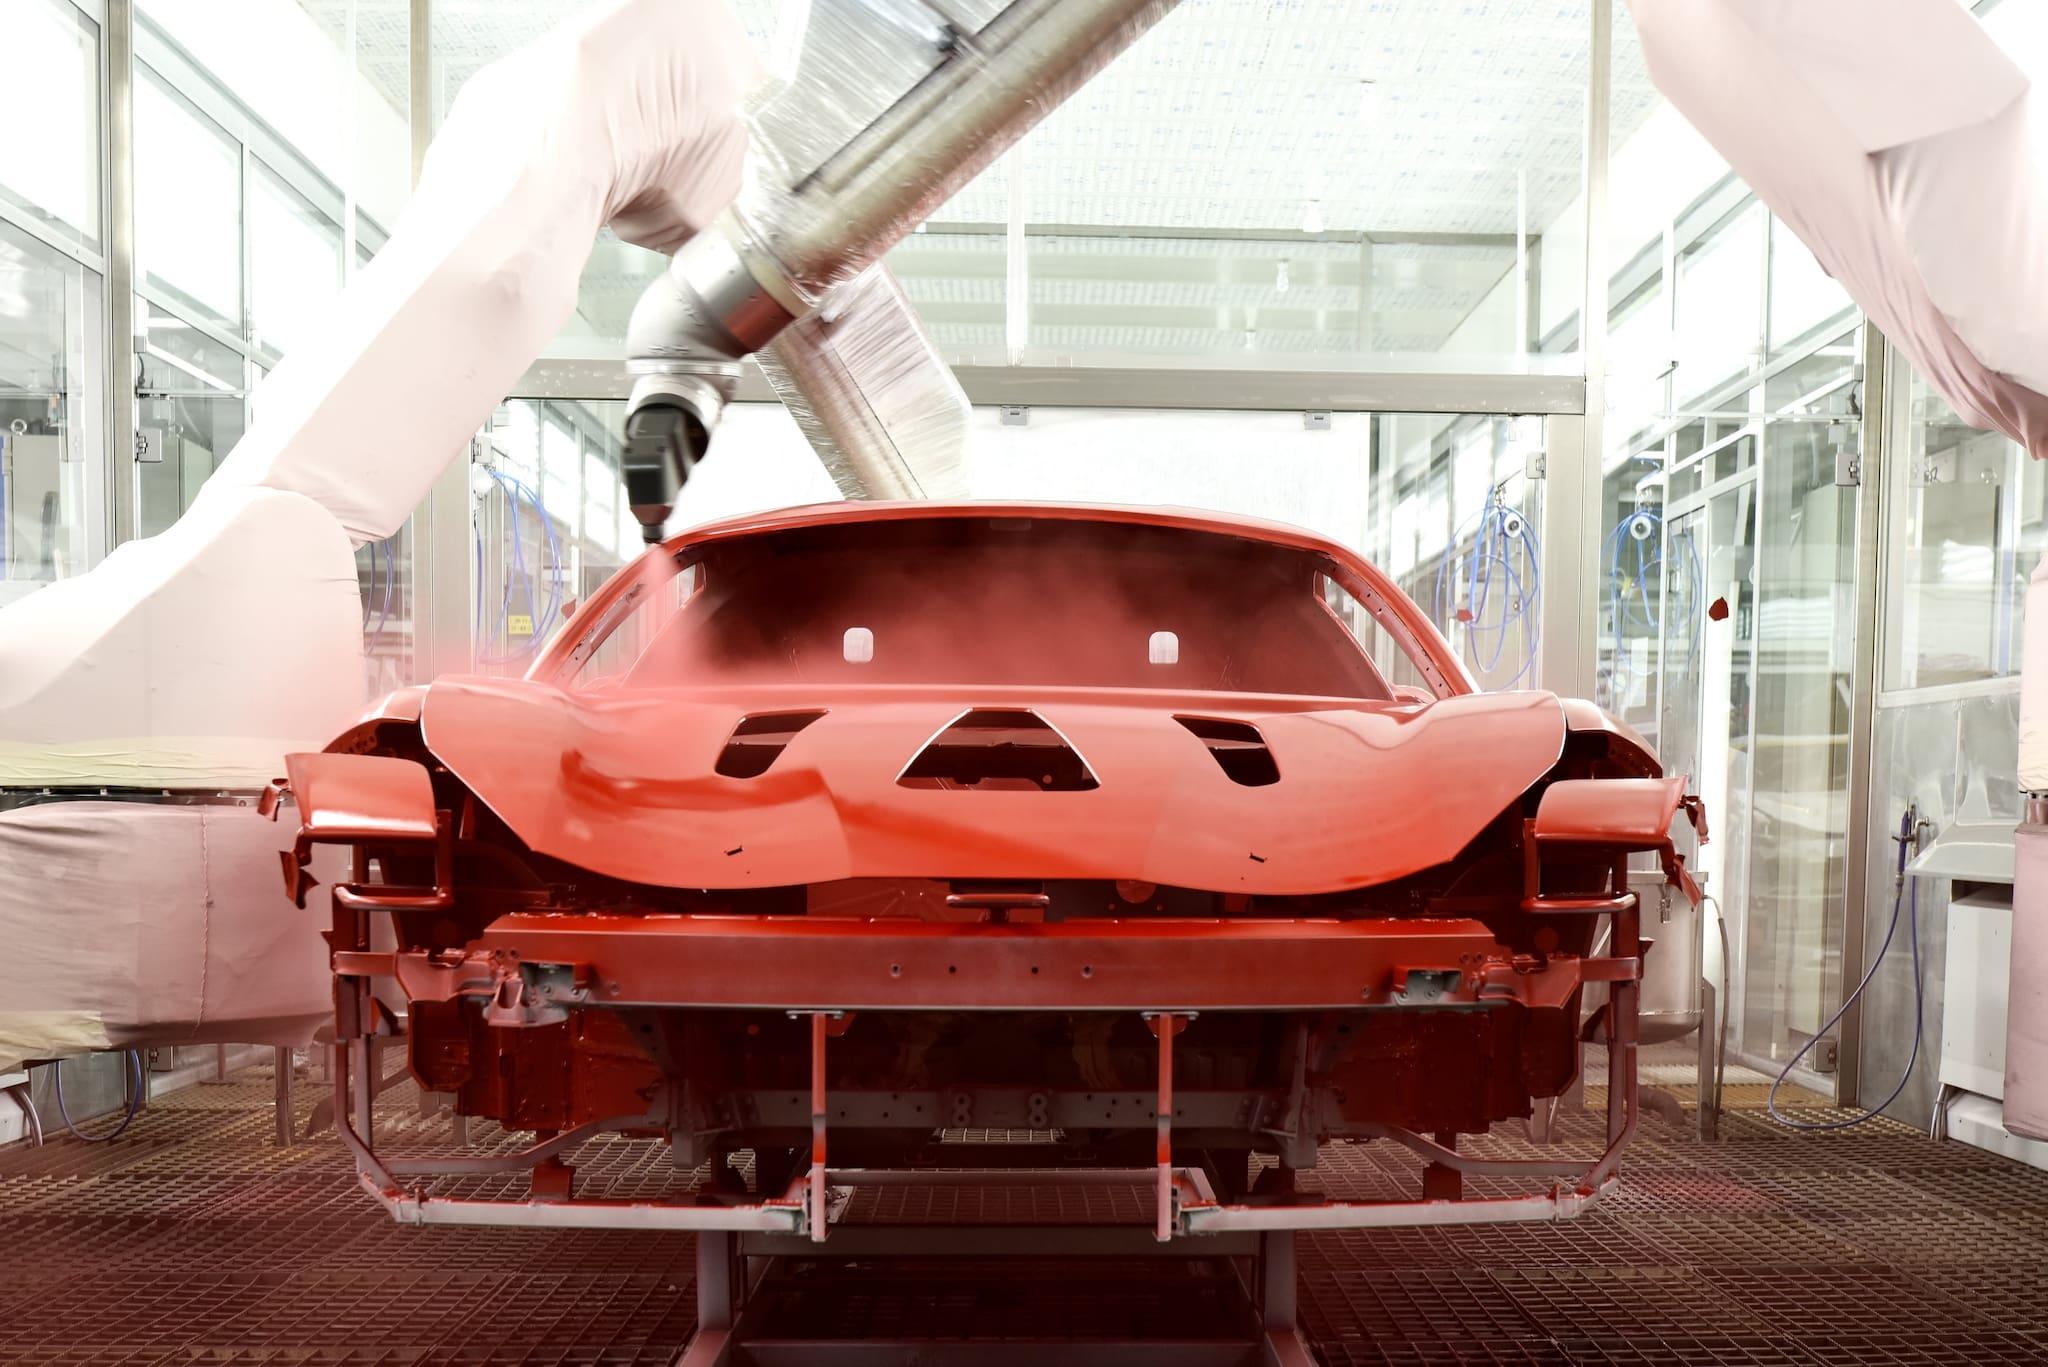 Ferrari Introduces World's First Low-Bake Paint Technology